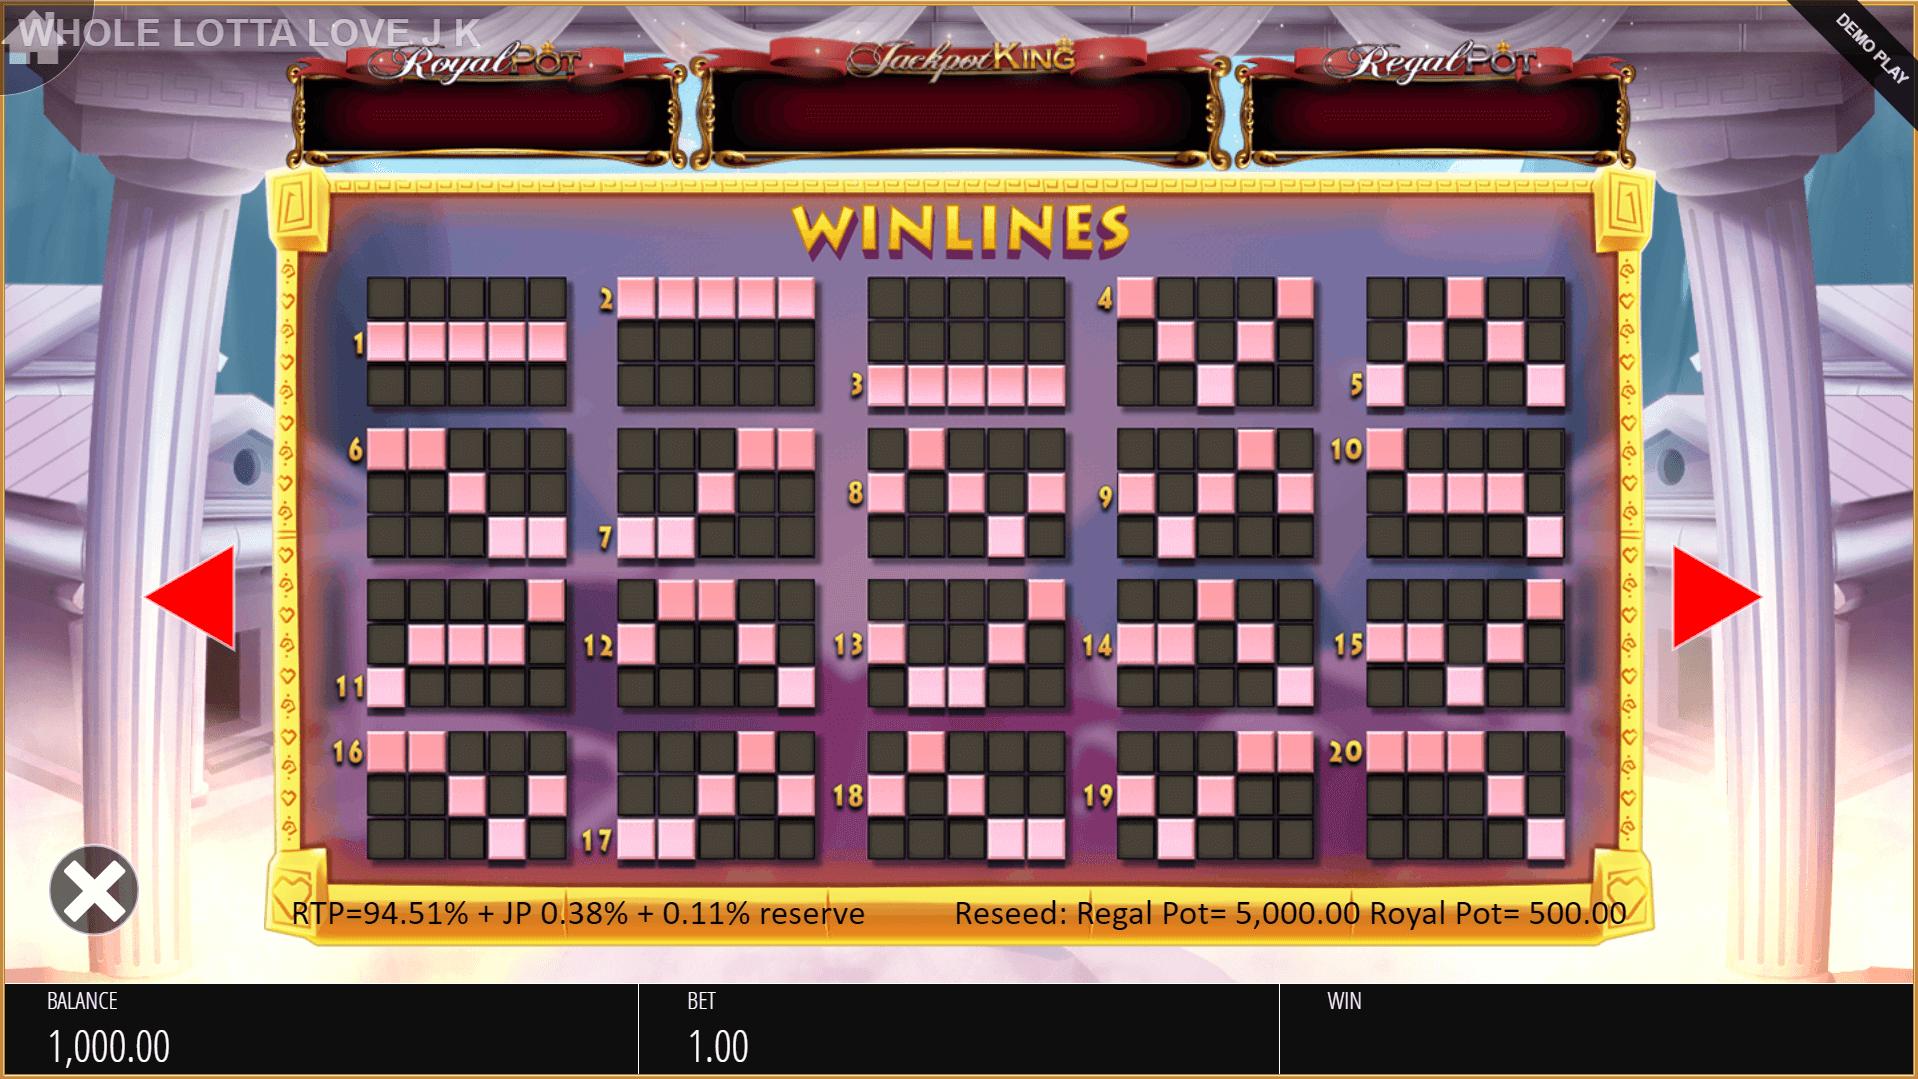 Whole Lotta Love Slot Machine